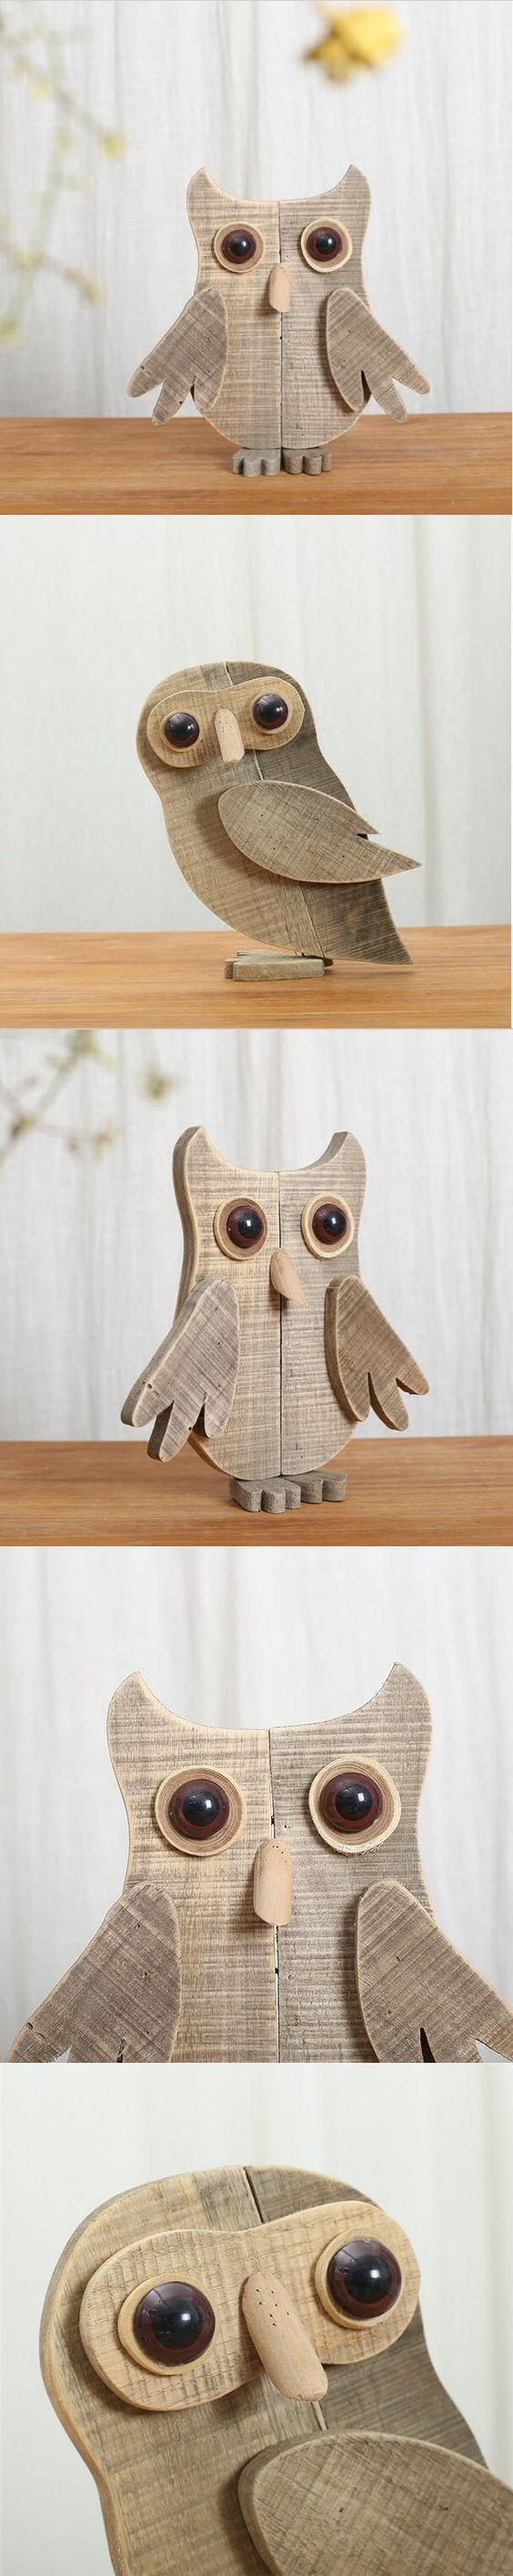 Simple original modern wooden animal desktop ornaments handmade abstract wood owl figurine new creative home decorations $46